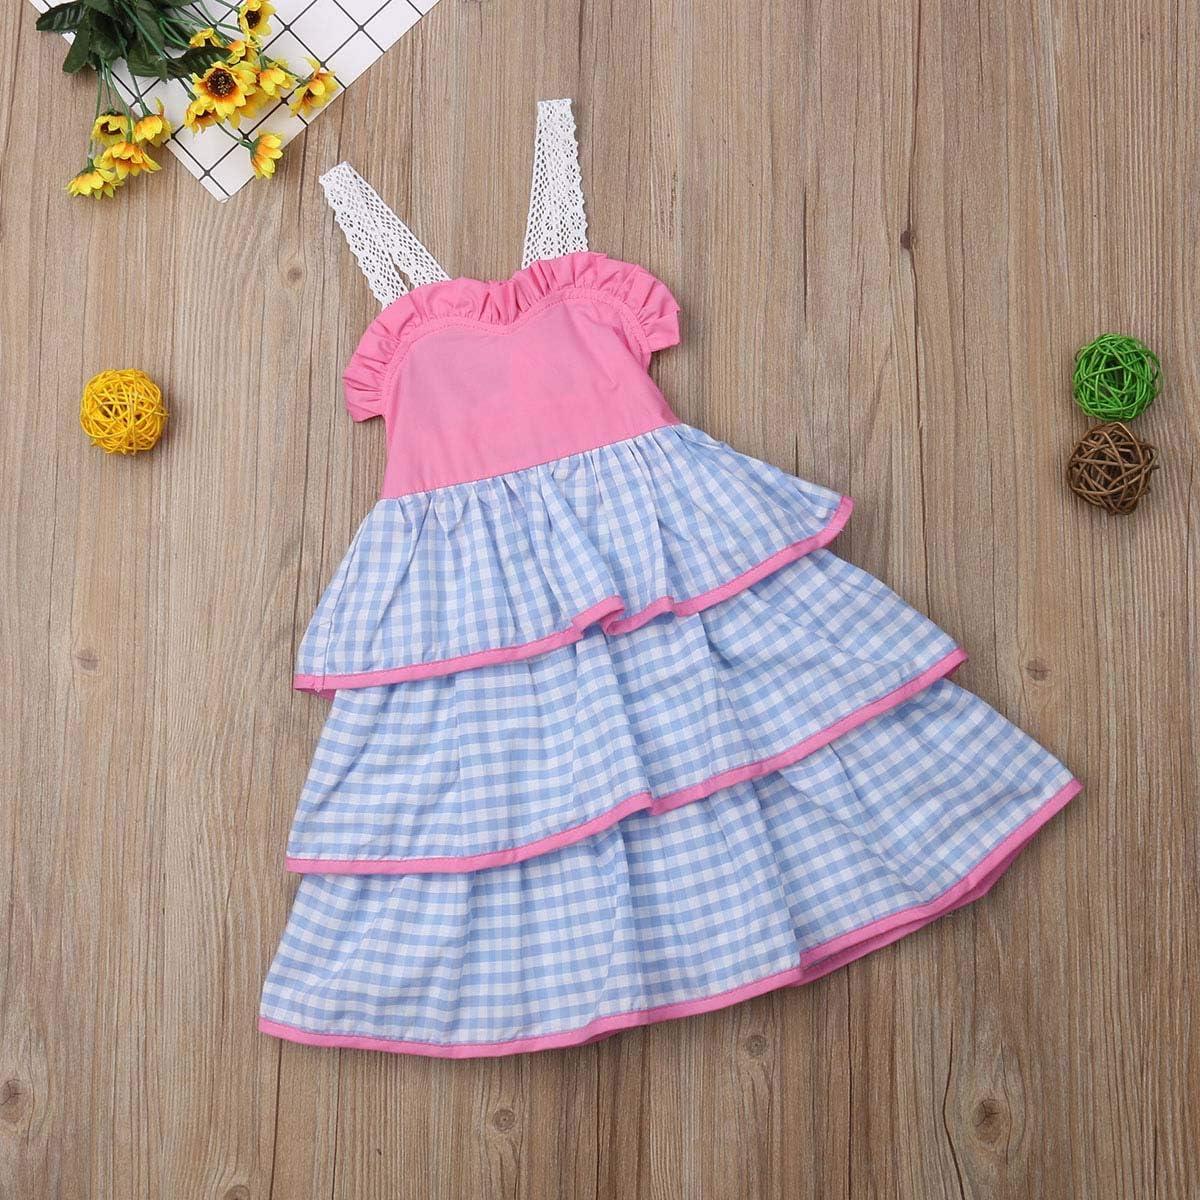 Guyay Baby Girl Sling Stitching Backless Princess Dress 3 Layer Dress Polka dot Striped Dress Party Banquet Dress Casual Tutu